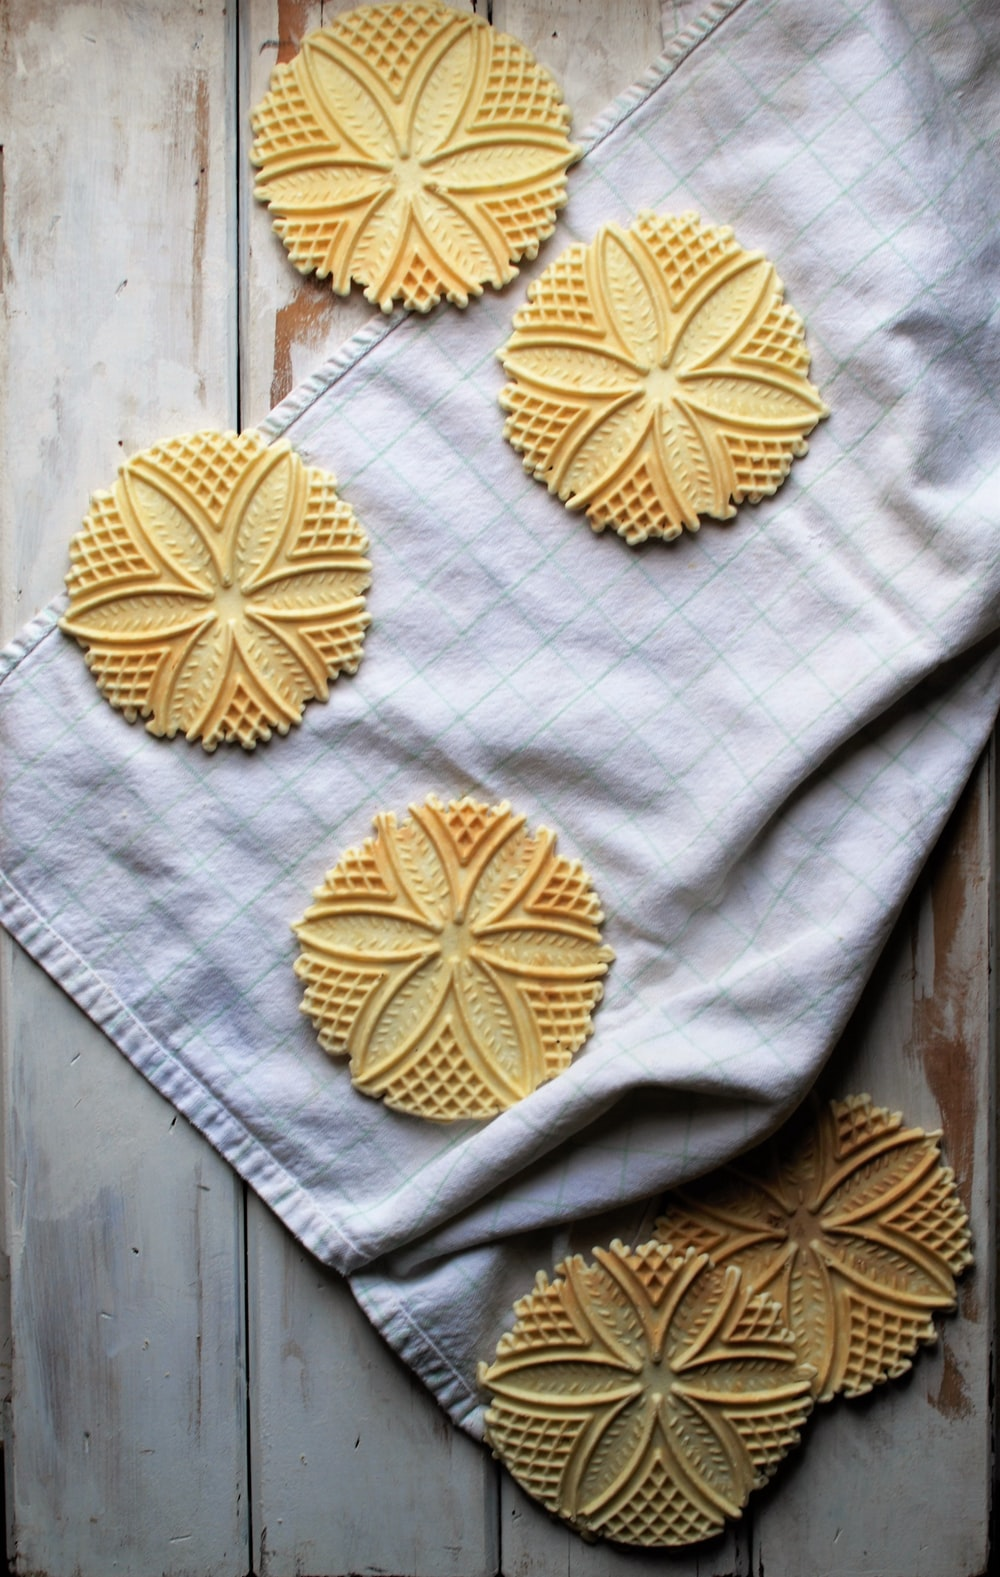 round brown pastries on top of white textile